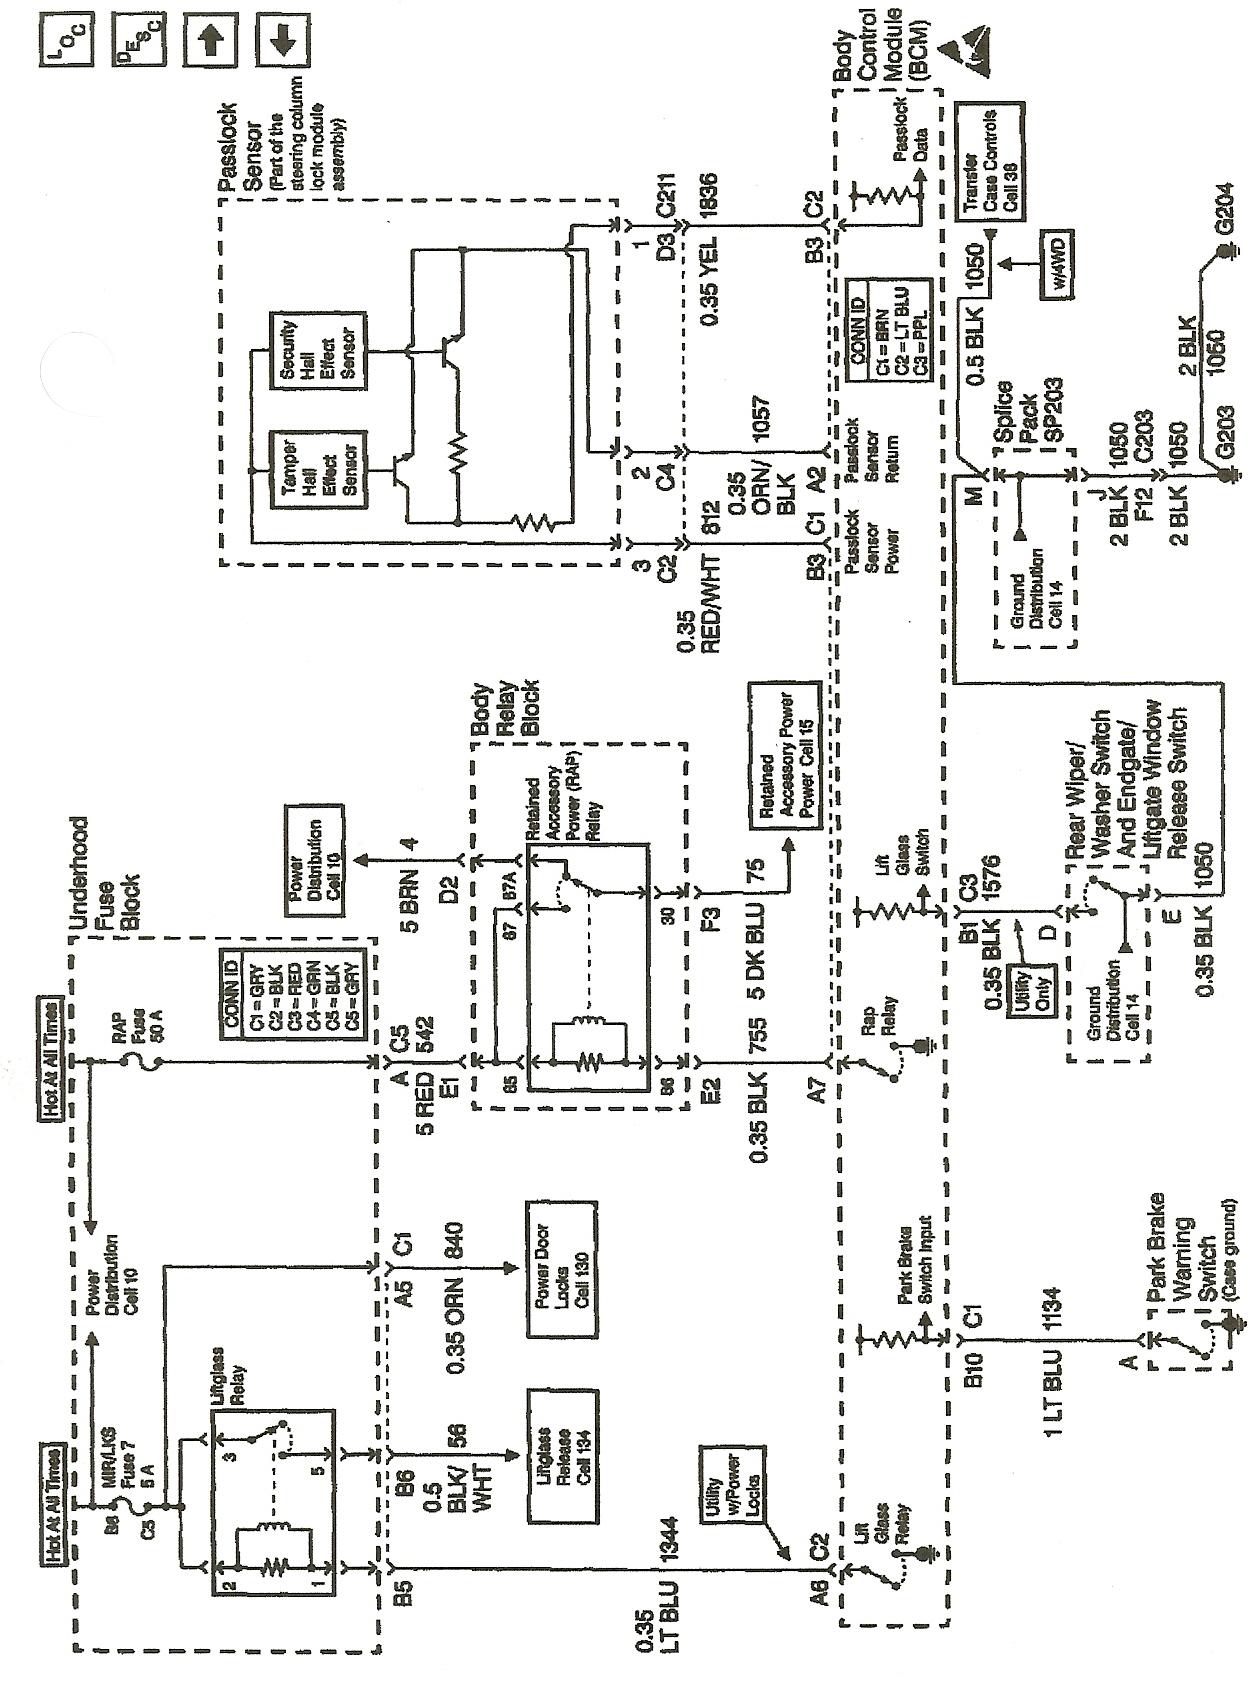 Wiring Diagram For Passlock 2 Chevy Silverado